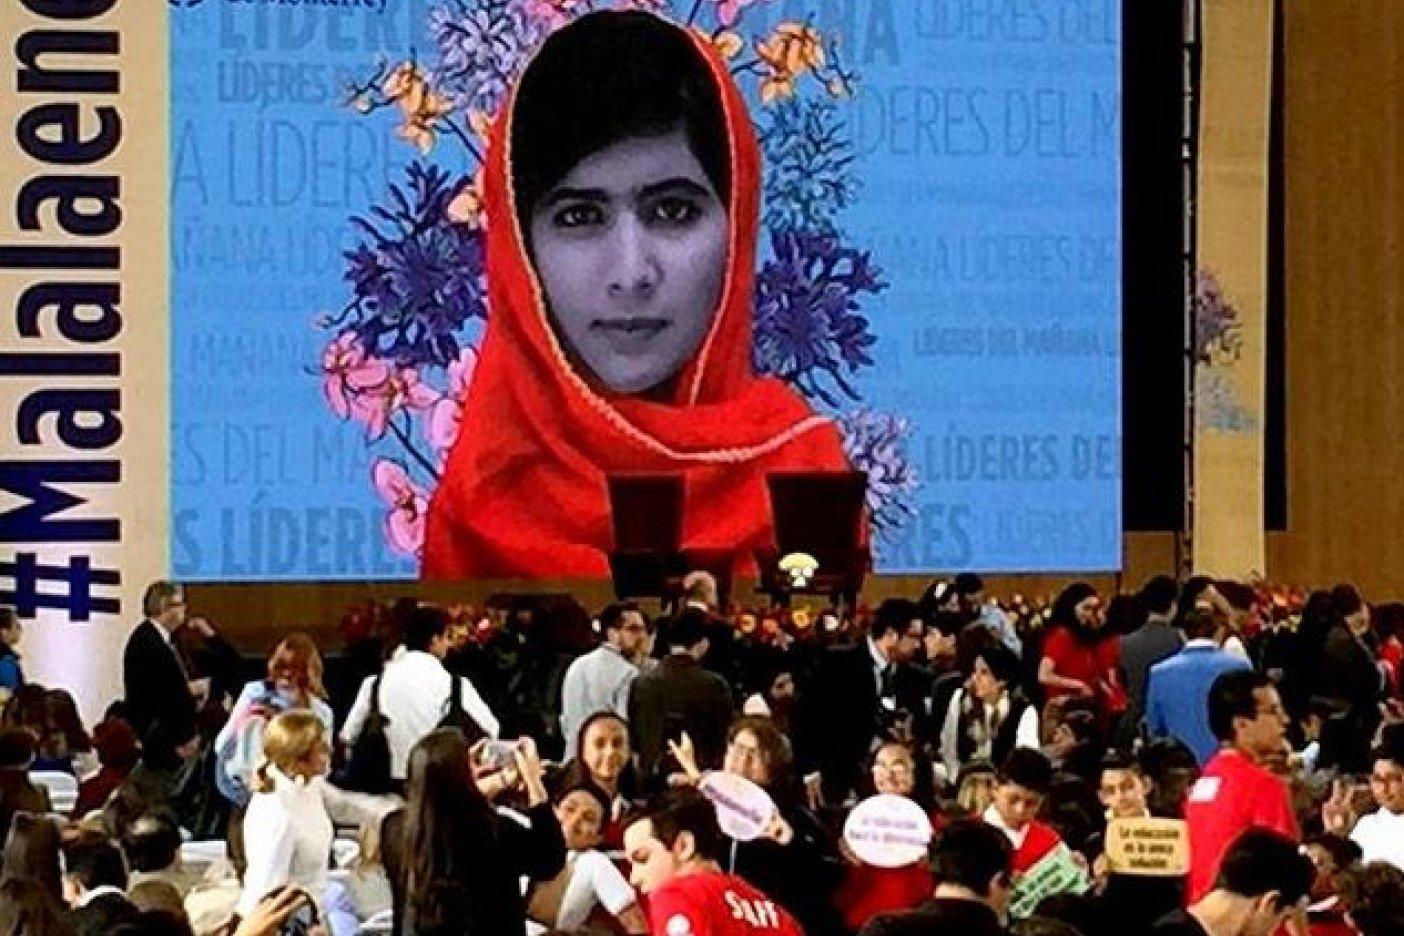 Telmex quiere que envíes preguntas a Malala Yousafzai